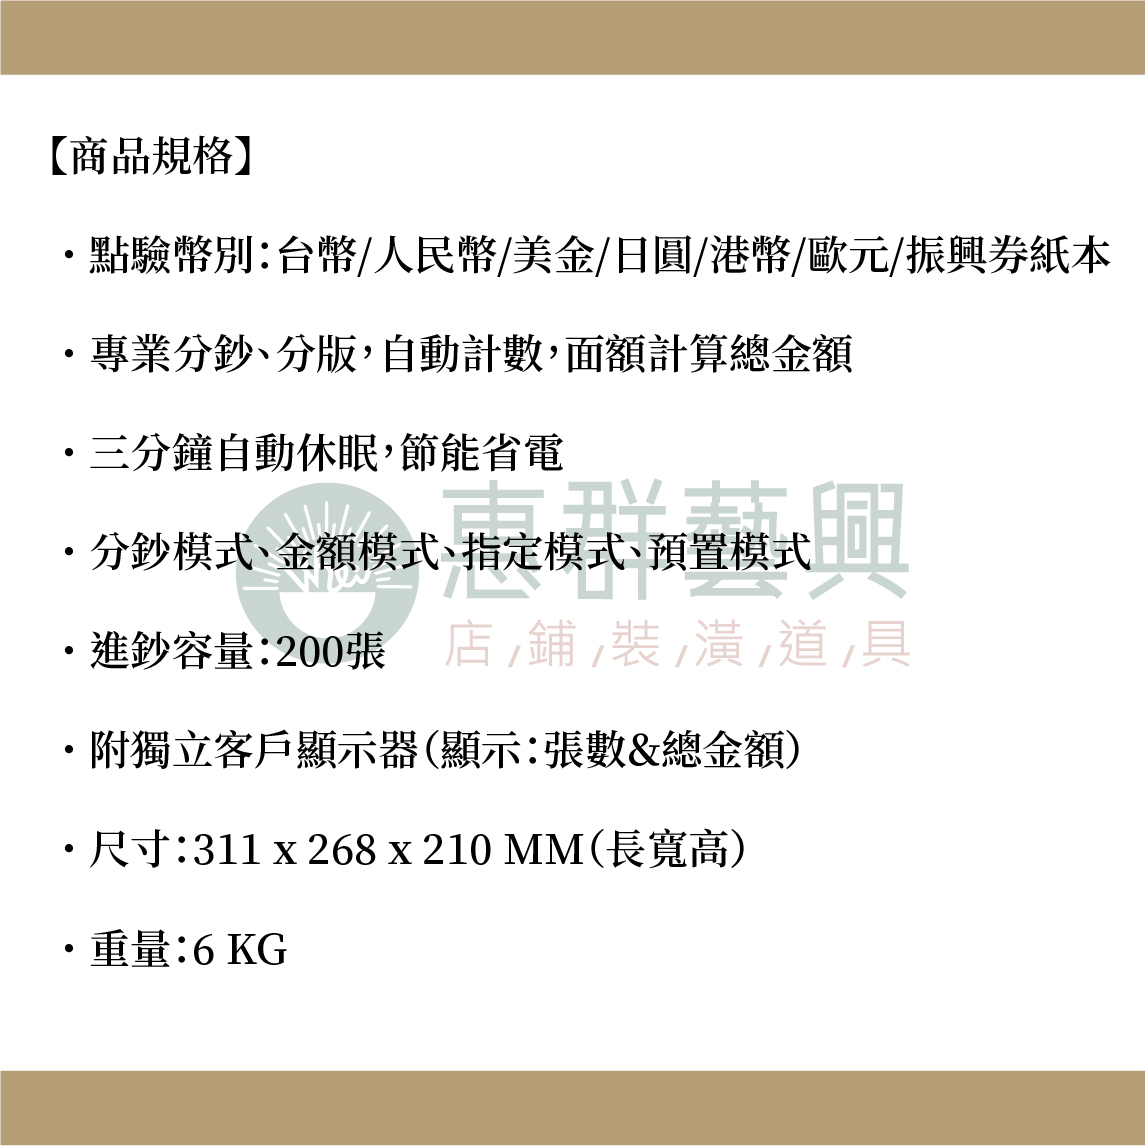 ANICE-GT9500 六國幣別點驗鈔機   惠群藝興陳列裝潢